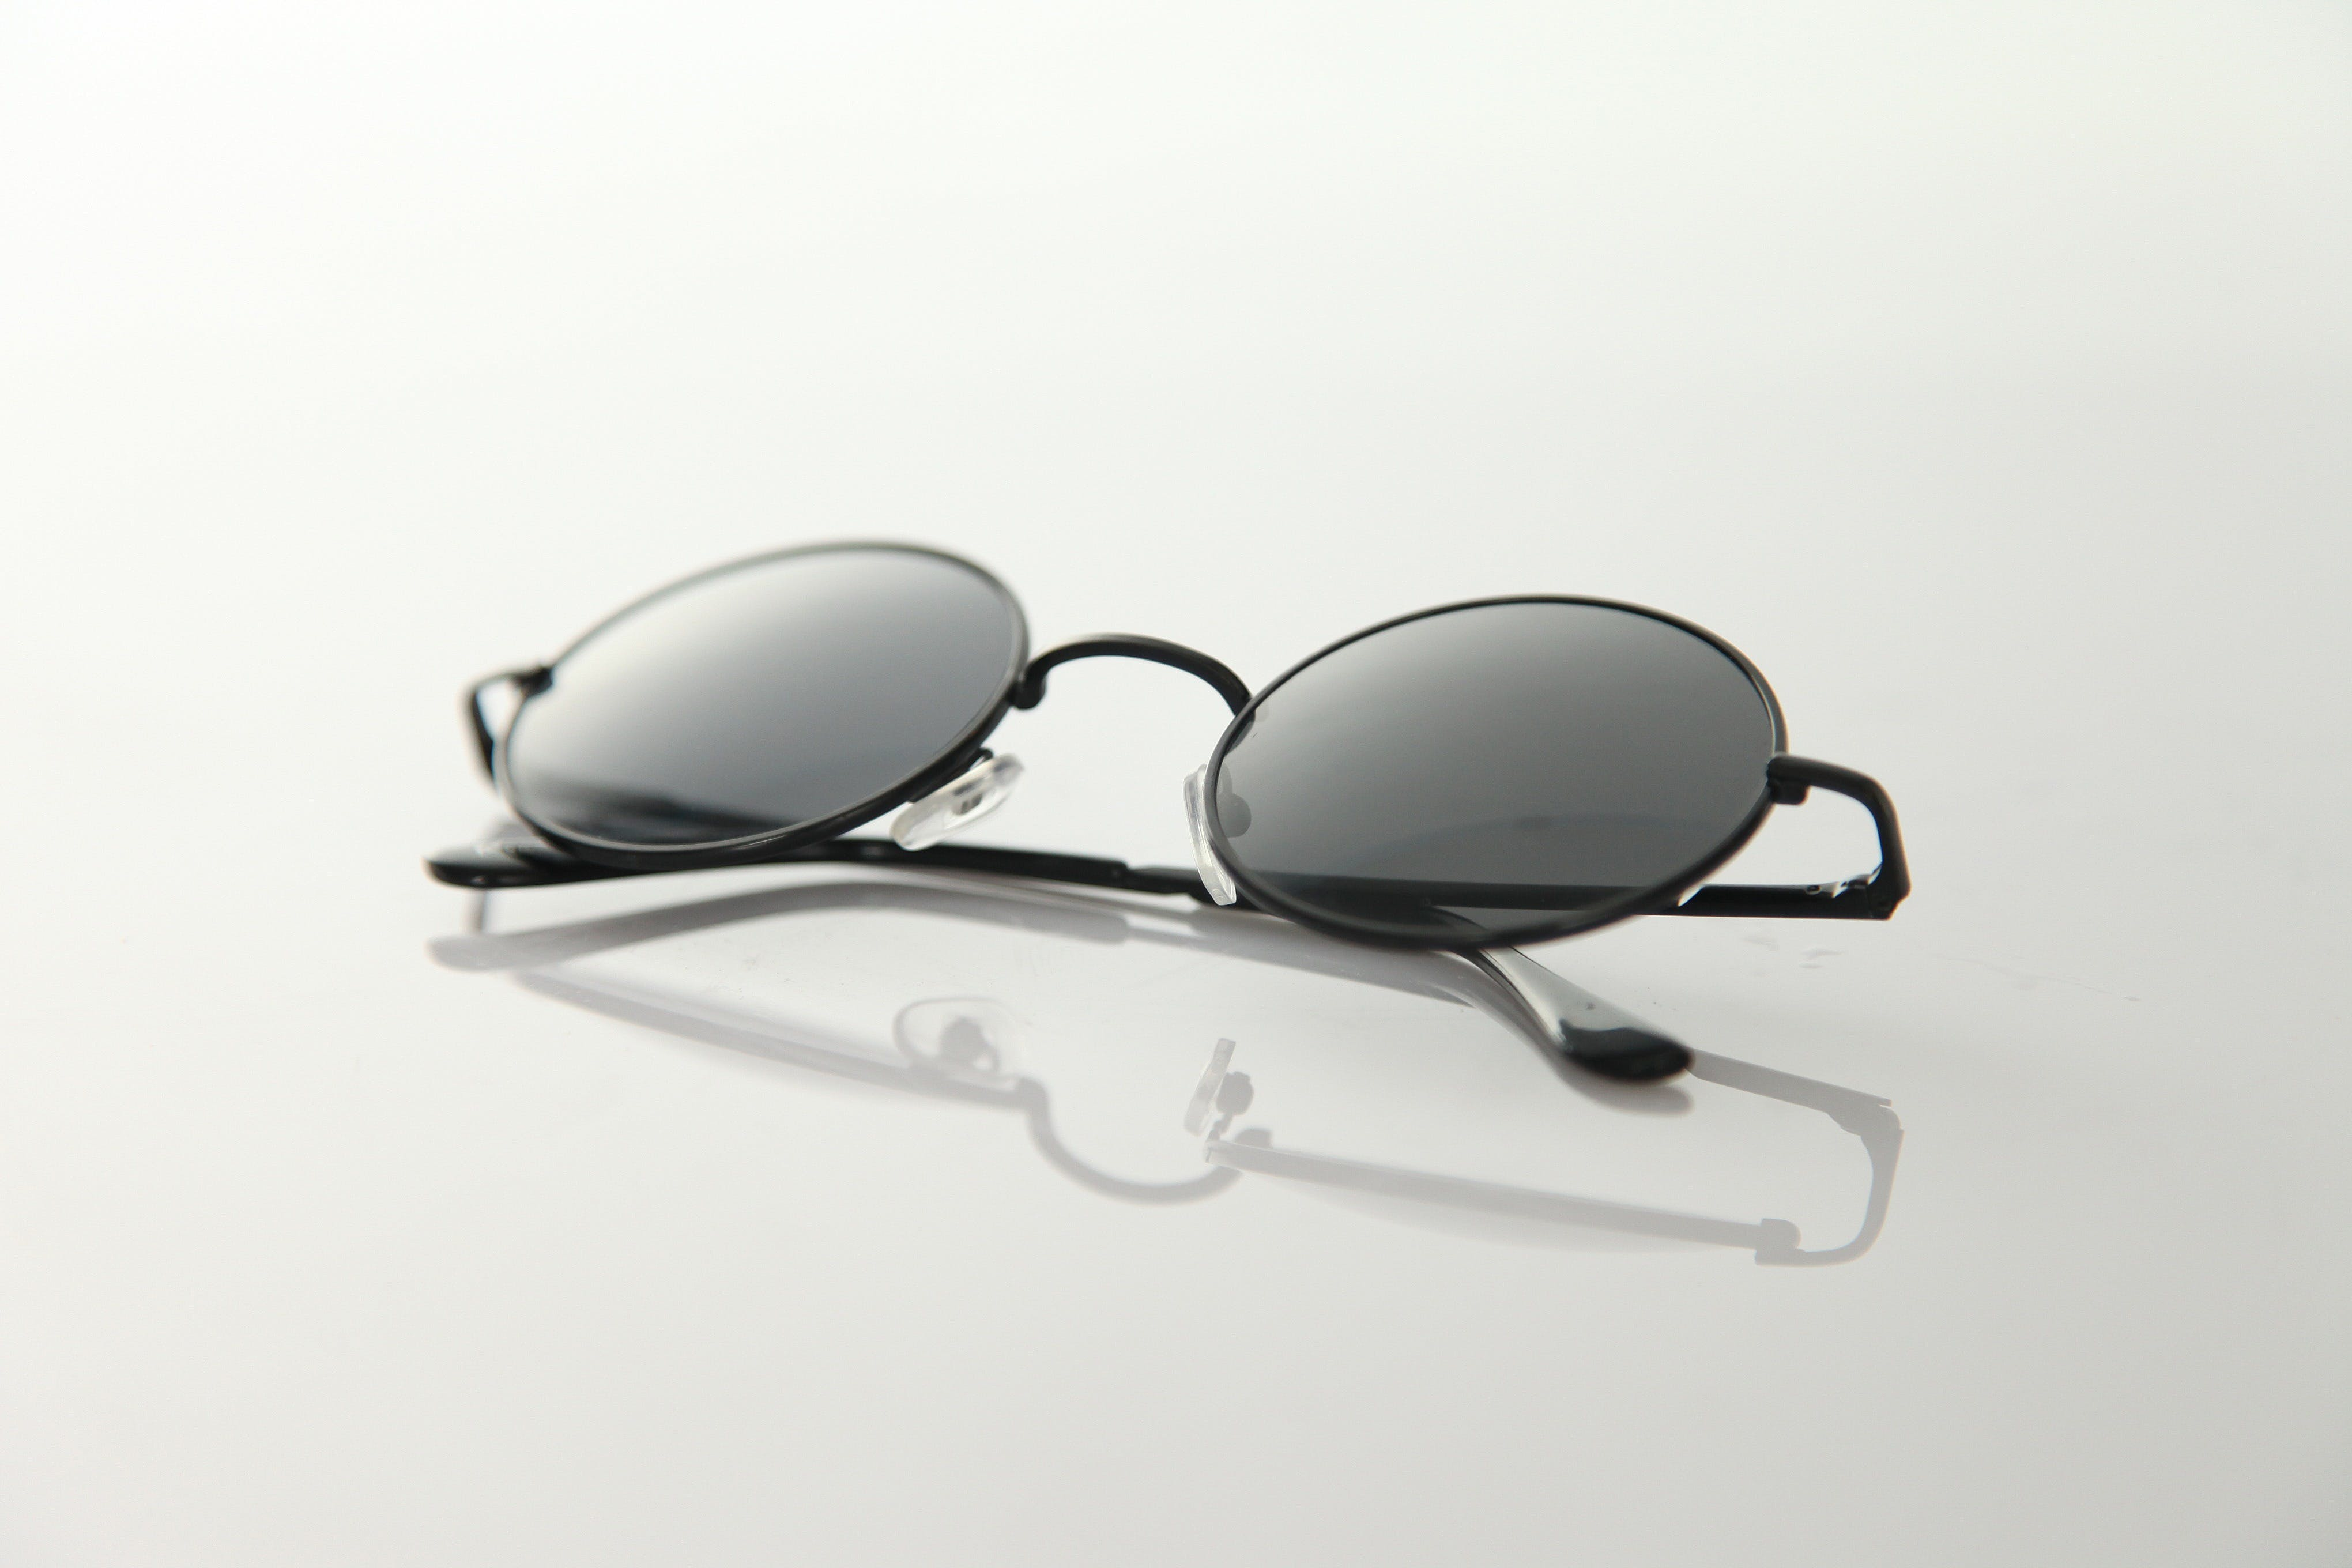 Black Frame Sunglasses on White Surface